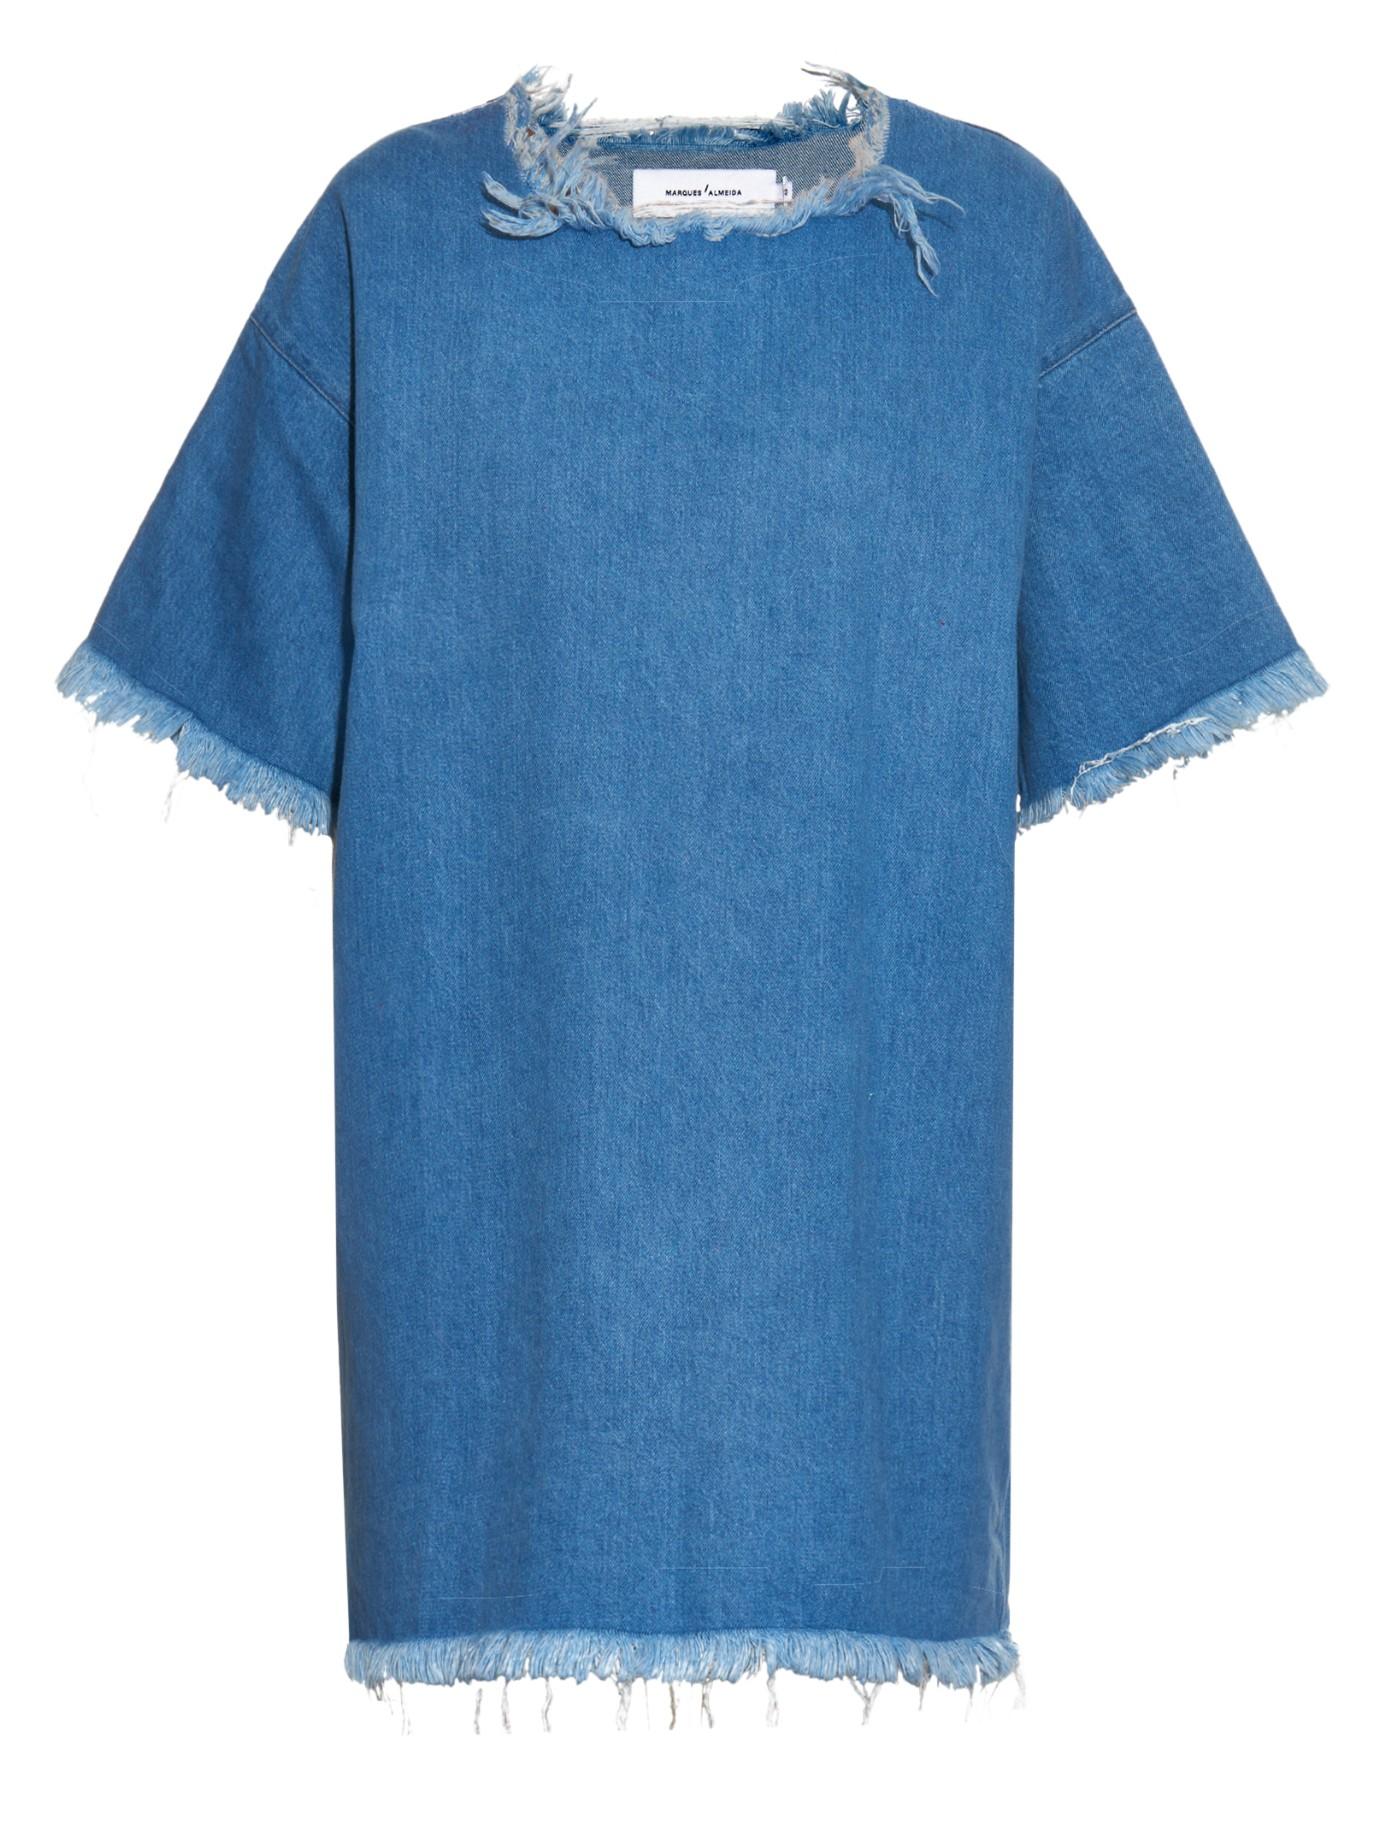 lyst marques 39 almeida oversized denim t shirt dress in blue. Black Bedroom Furniture Sets. Home Design Ideas